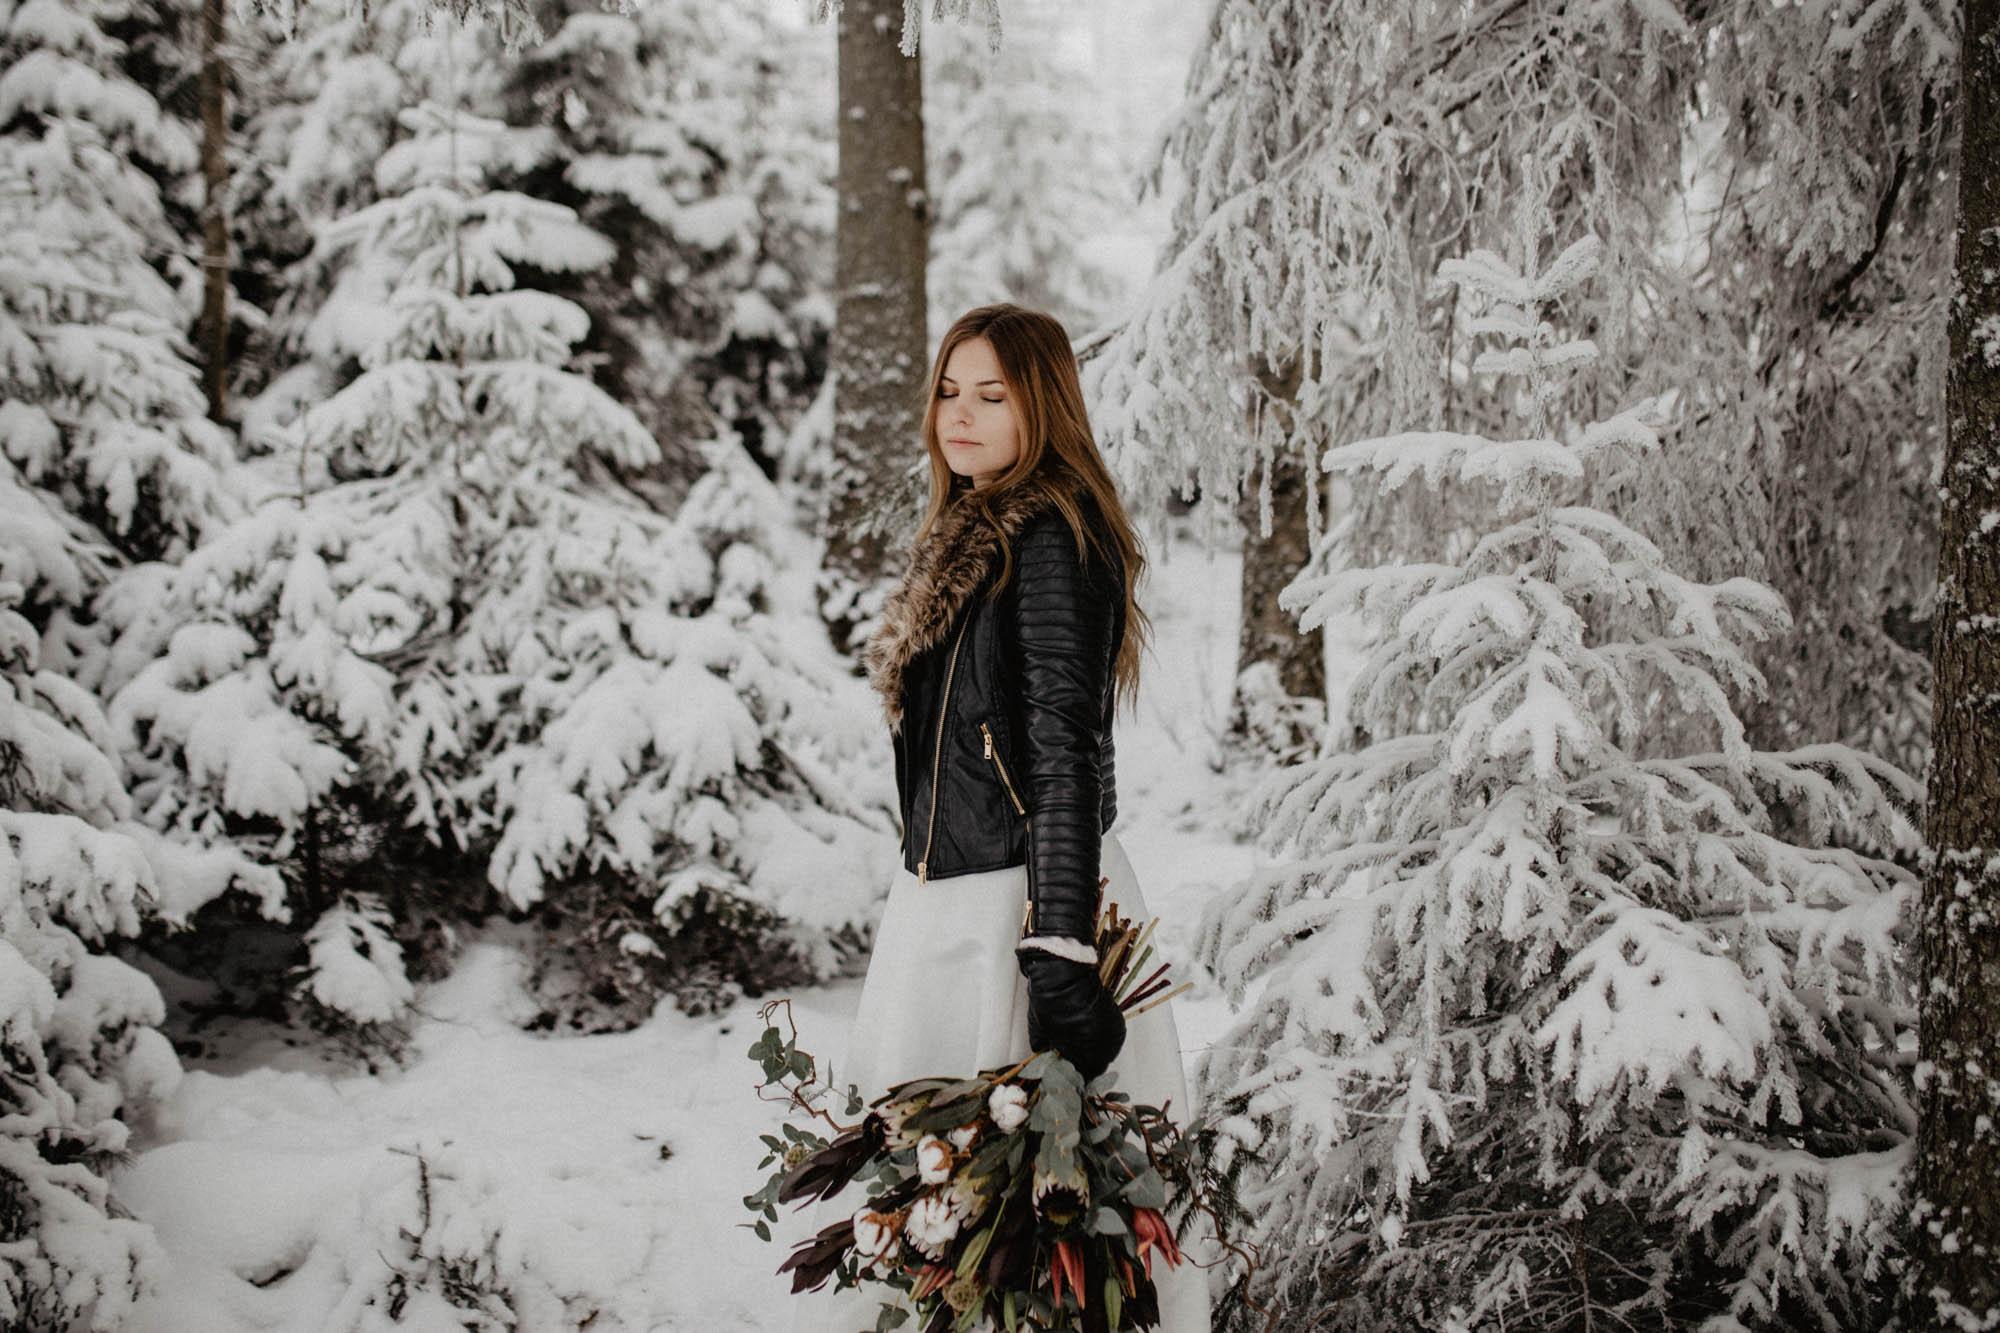 ashley_schulman_photography-winter_wedding_tampere-37.jpg